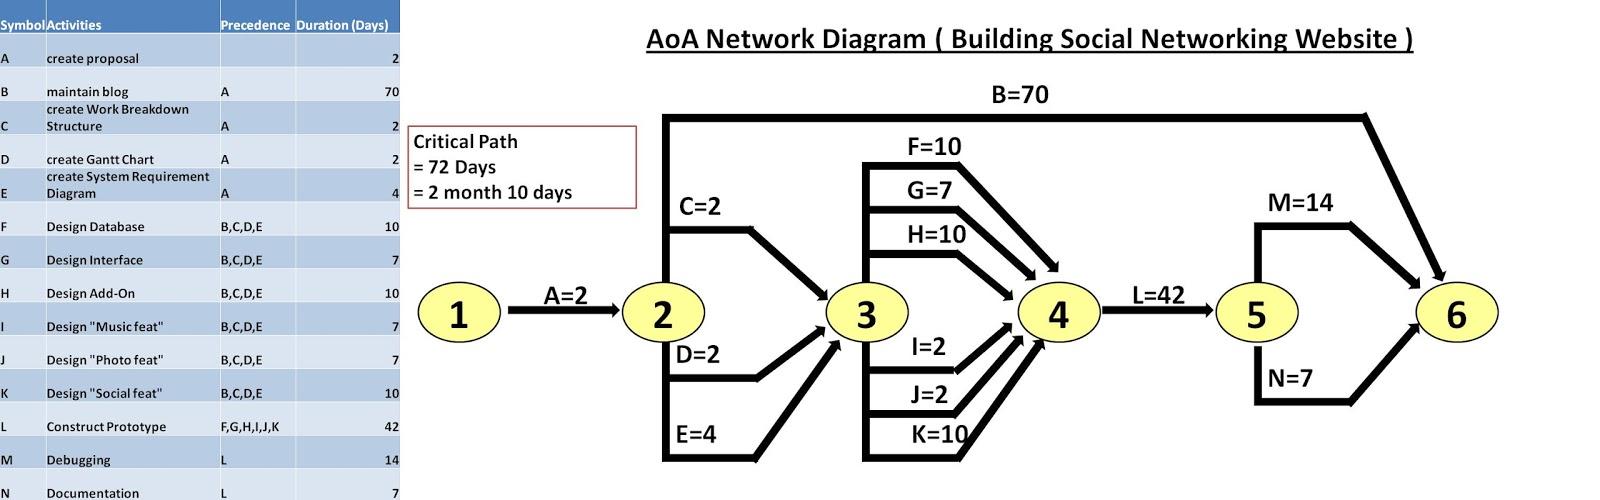 medium resolution of aoa network diagram building social networking website ver 1